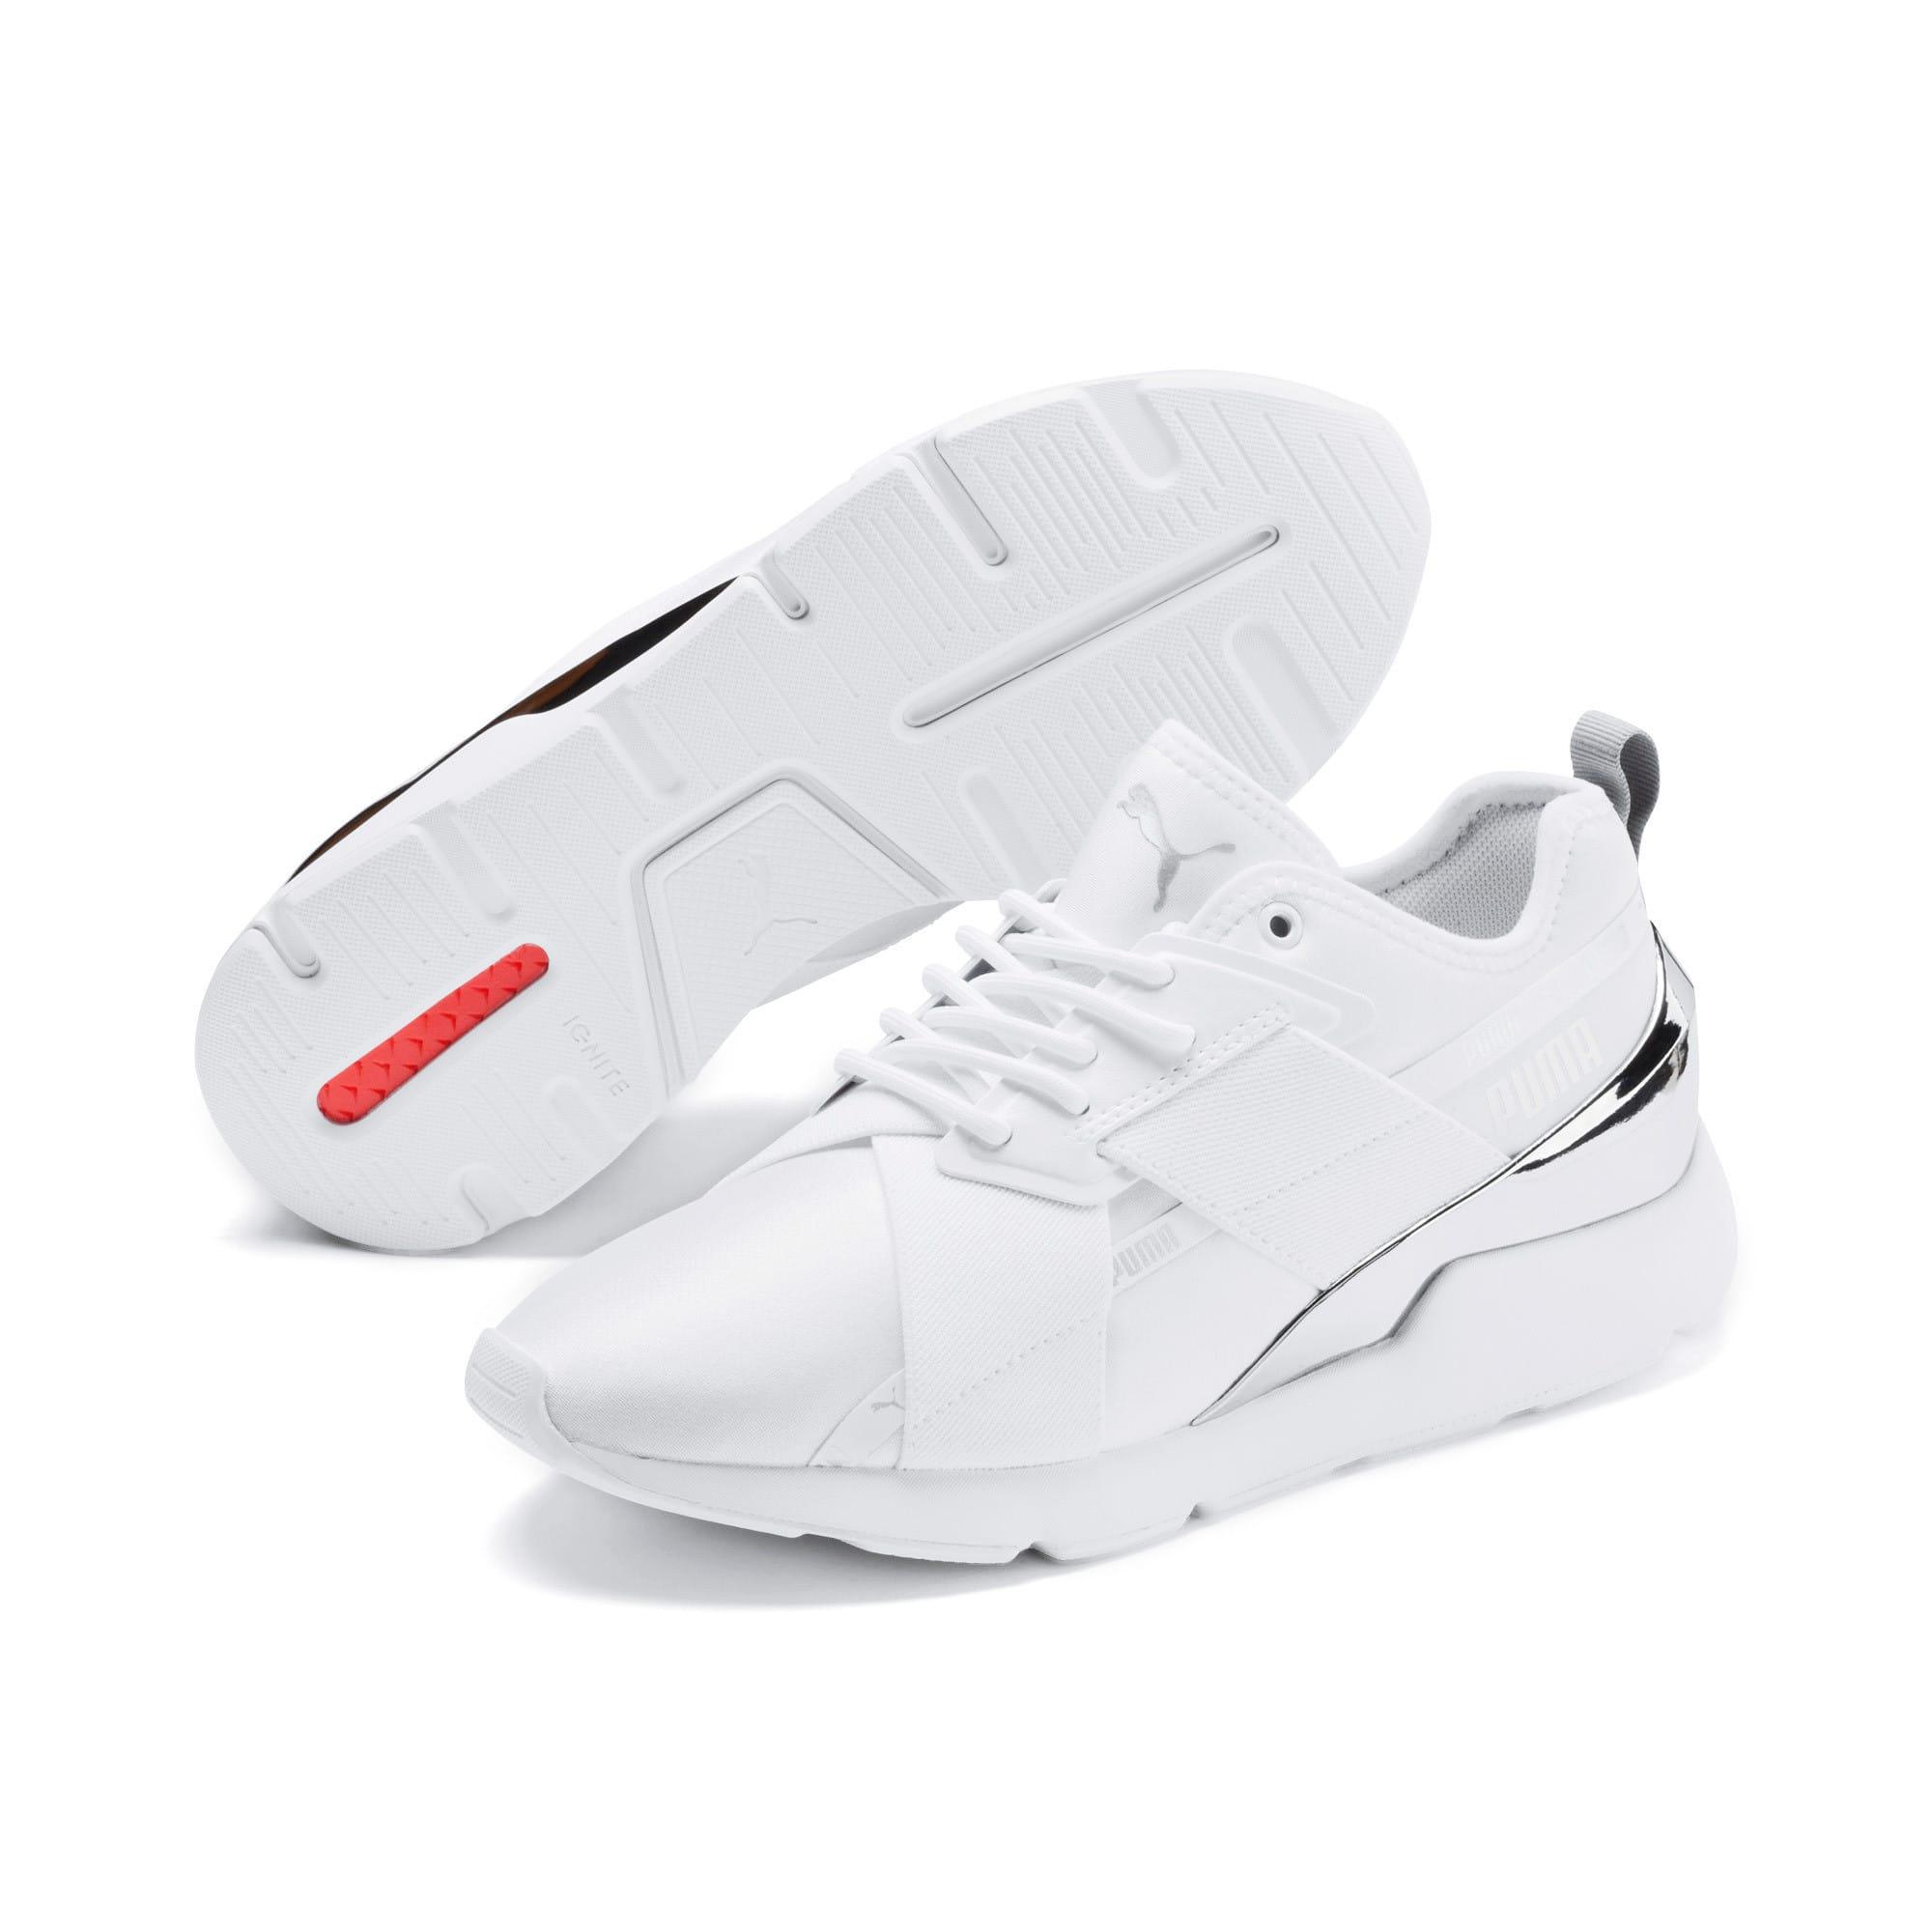 Thumbnail 3 of Muse X-2 Metallic Women's Sneakers, Puma White, medium